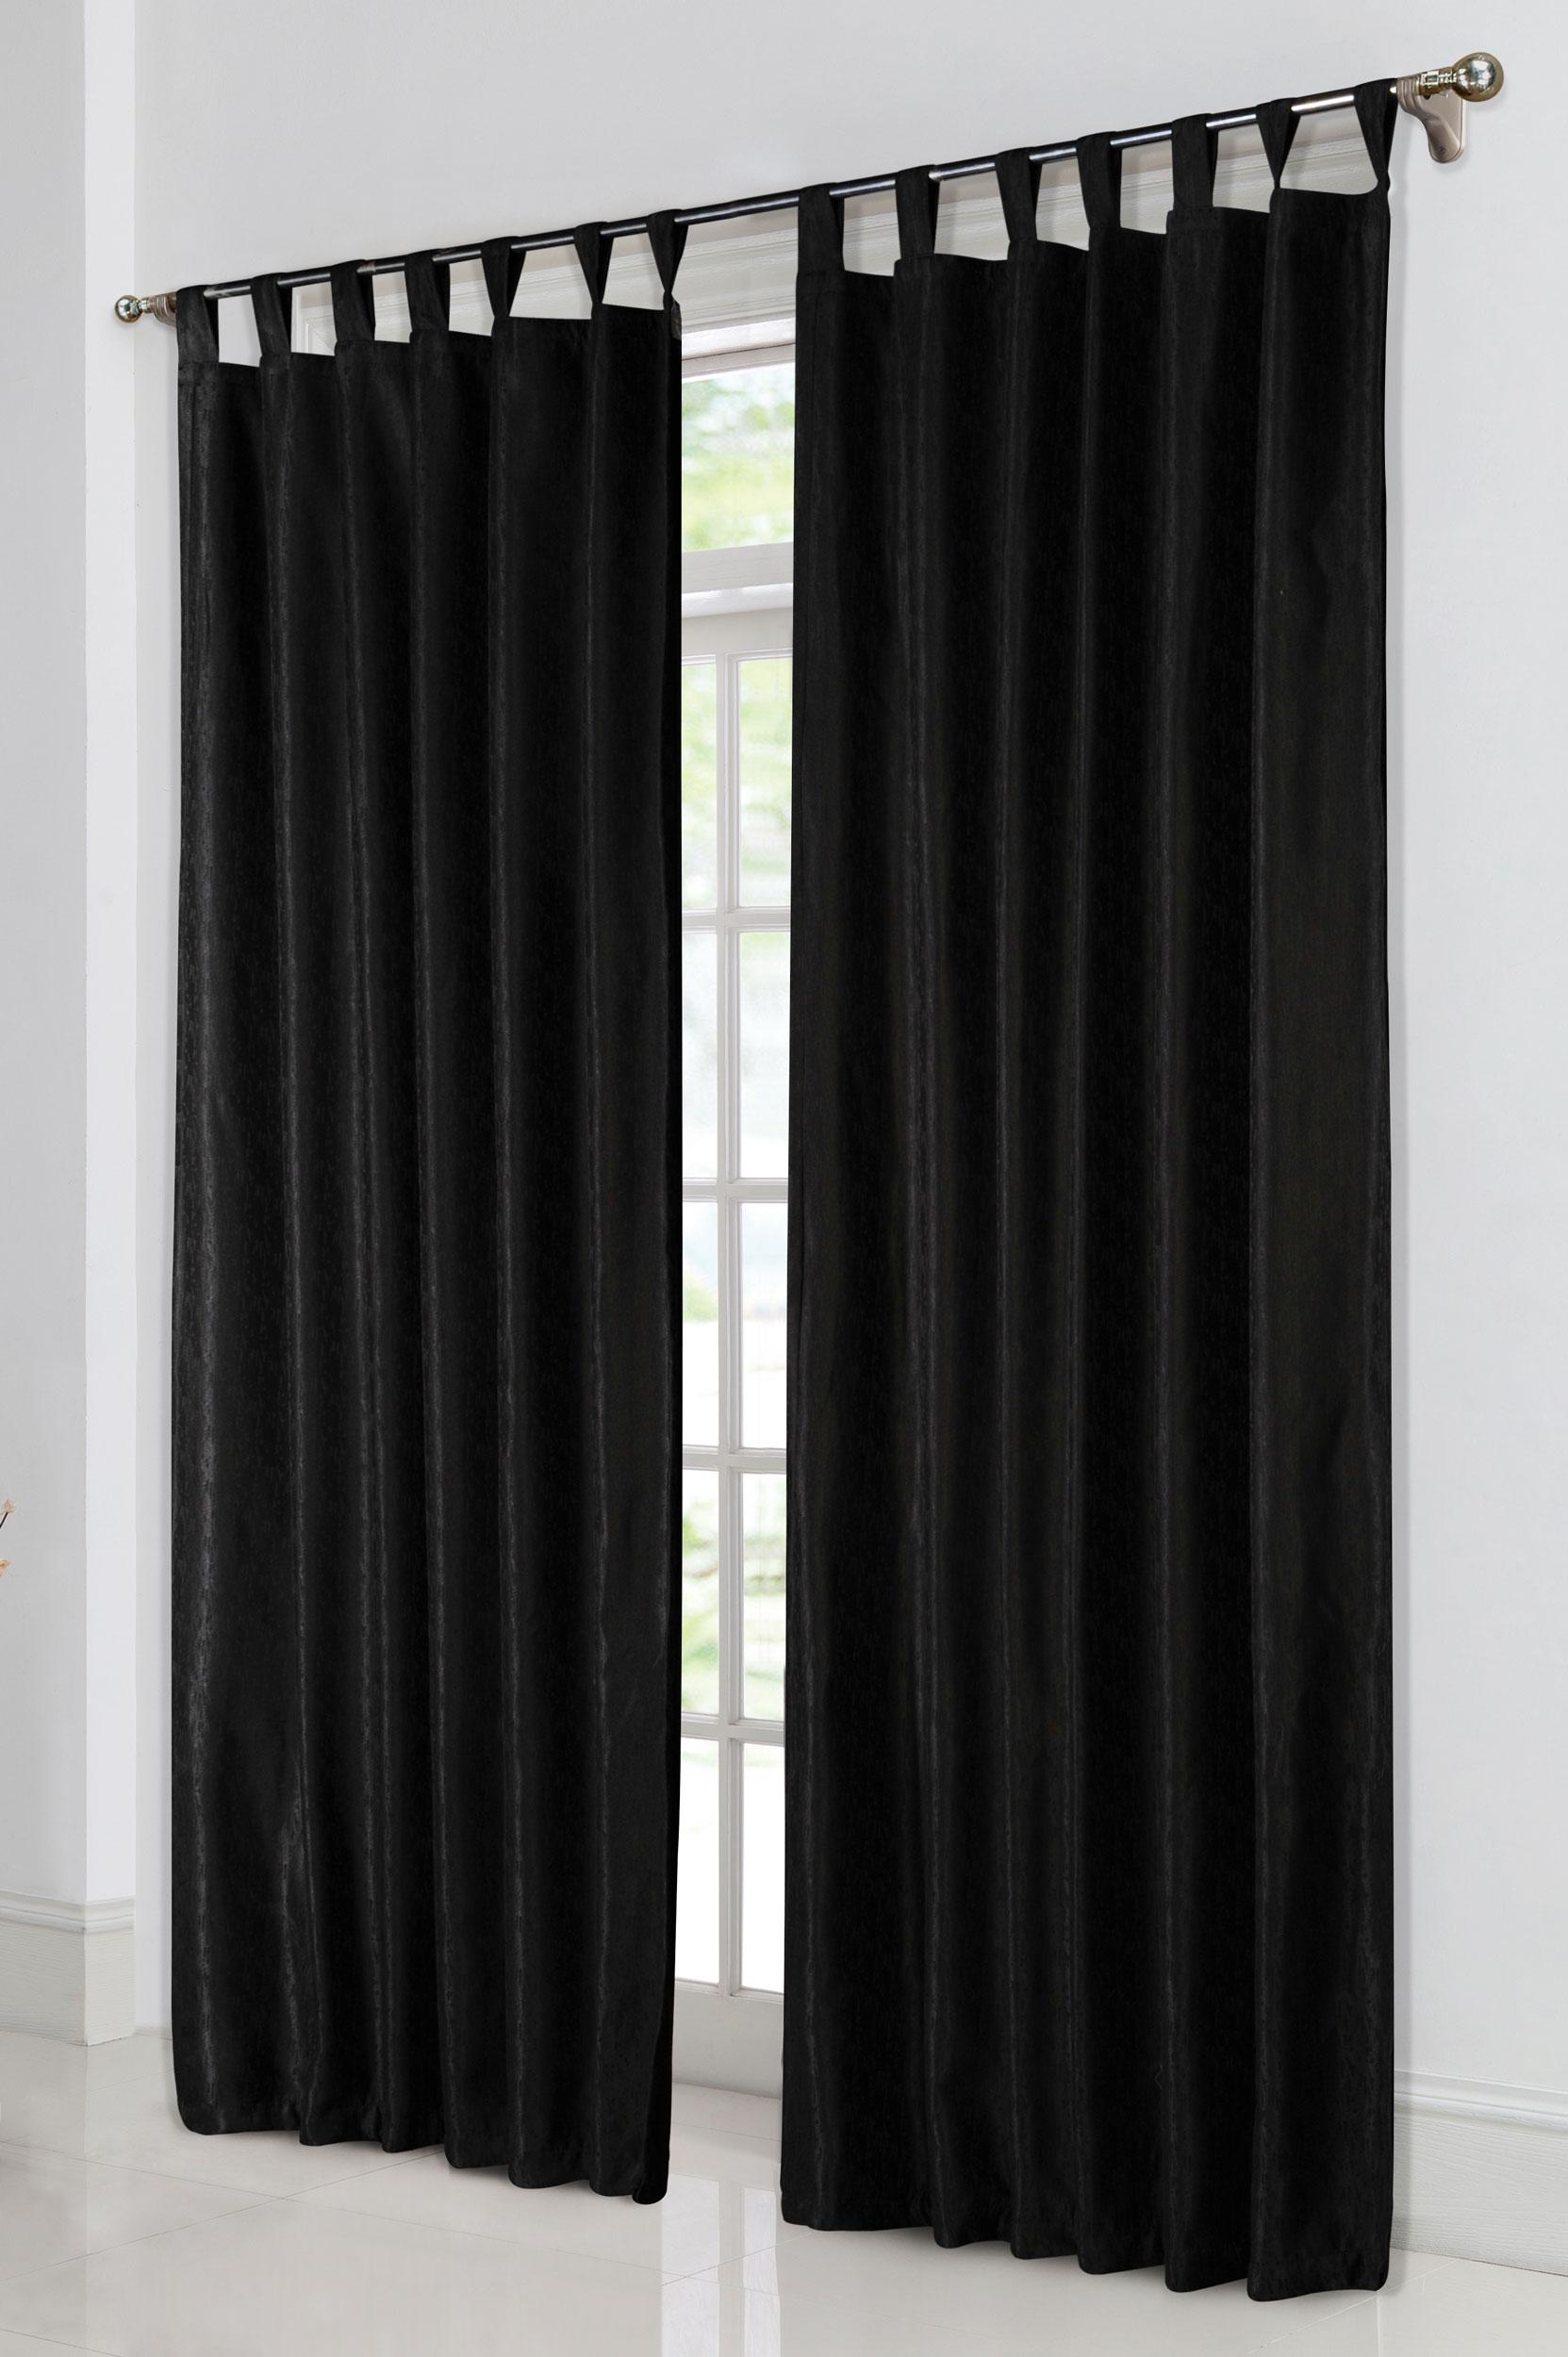 thermo gardine vorhang mit polar fleece r cken matt blickdicht 20500 ebay. Black Bedroom Furniture Sets. Home Design Ideas